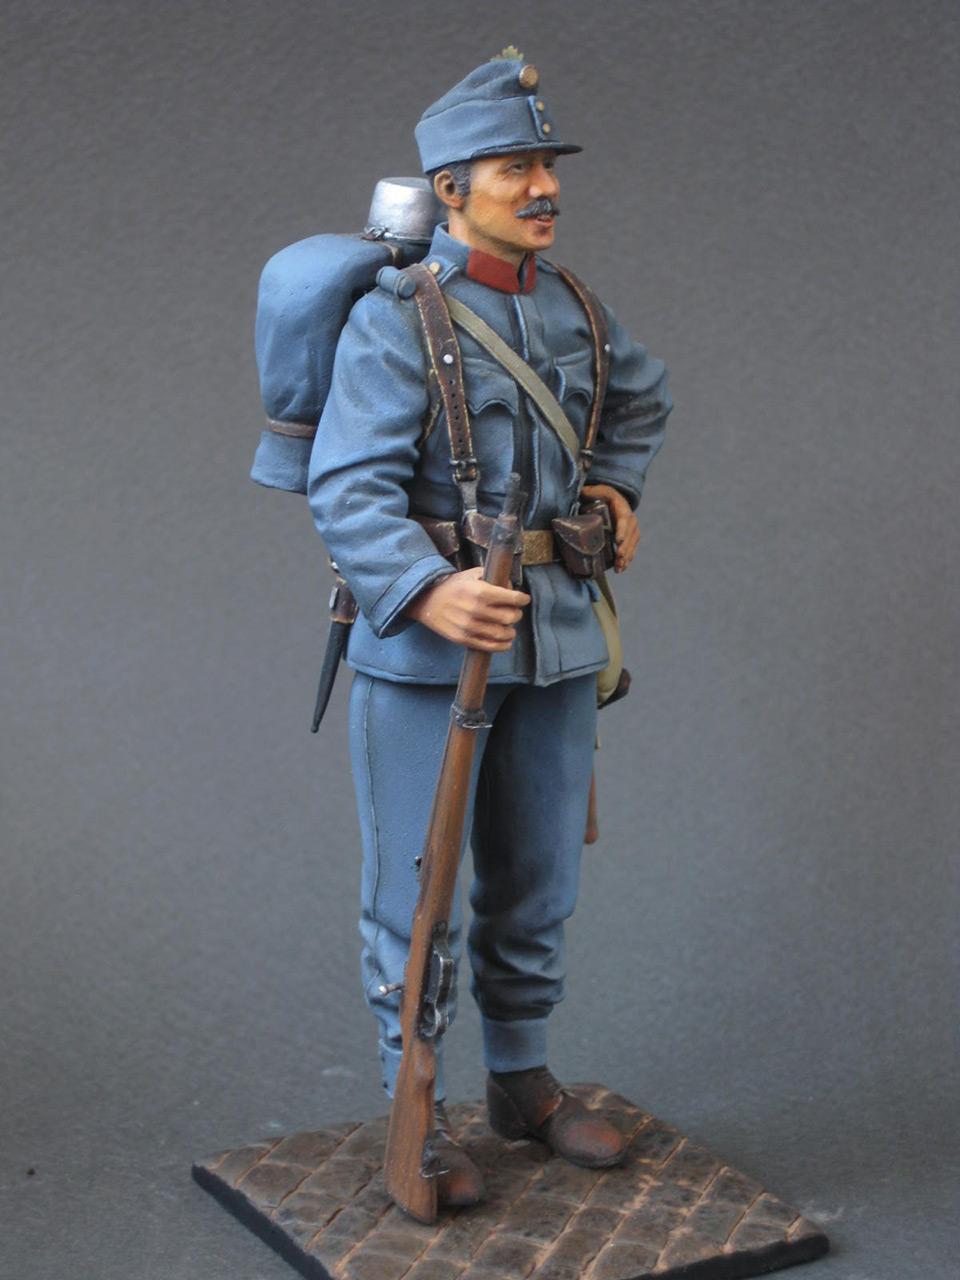 Фигурки: Австро-Венгерский пехотинец, 1914 г. , фото #9